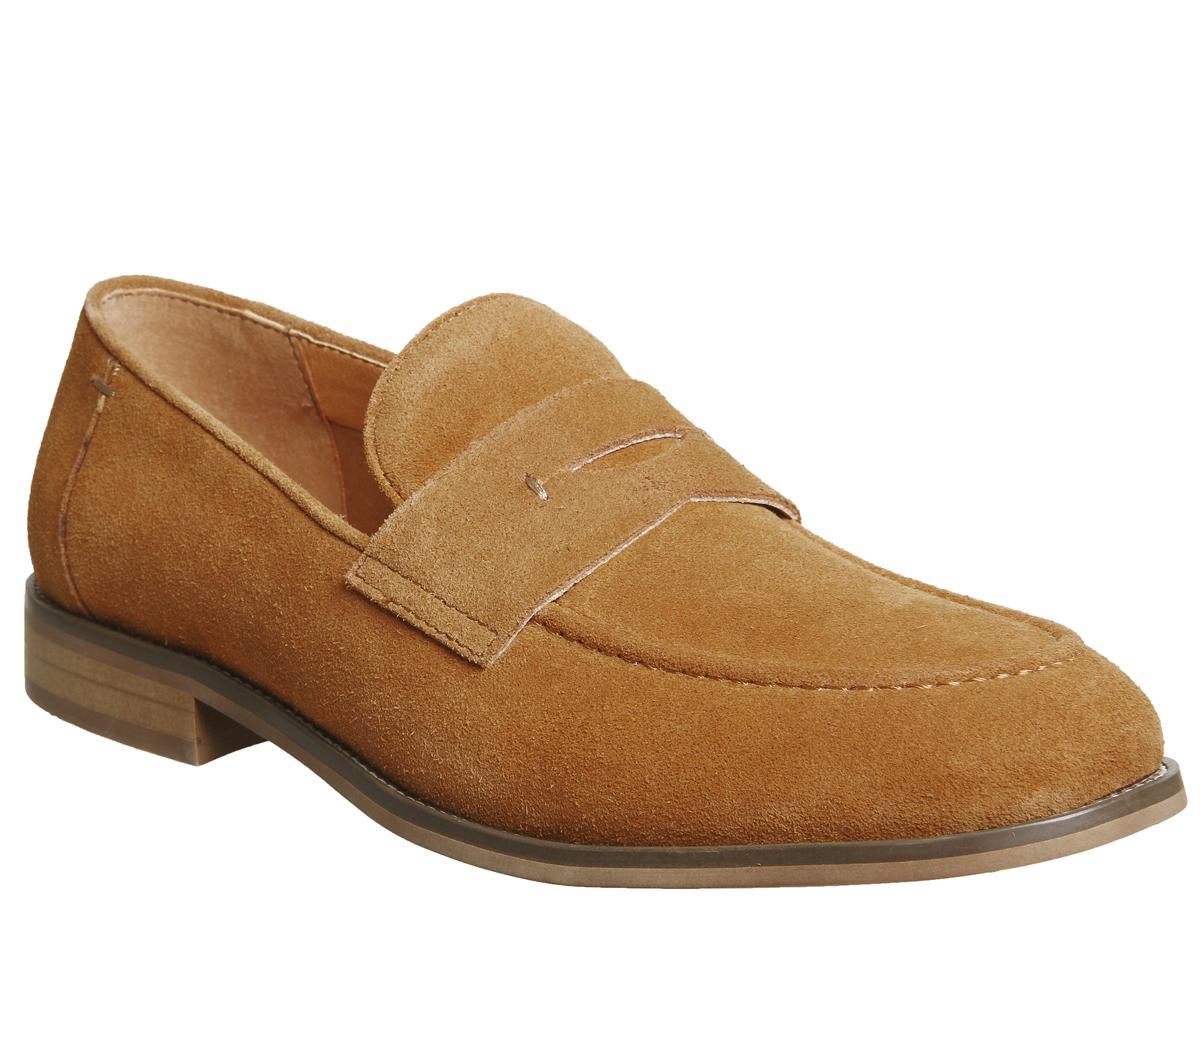 Mens Office orange Suede Slip On Loafers Size Ex-Display